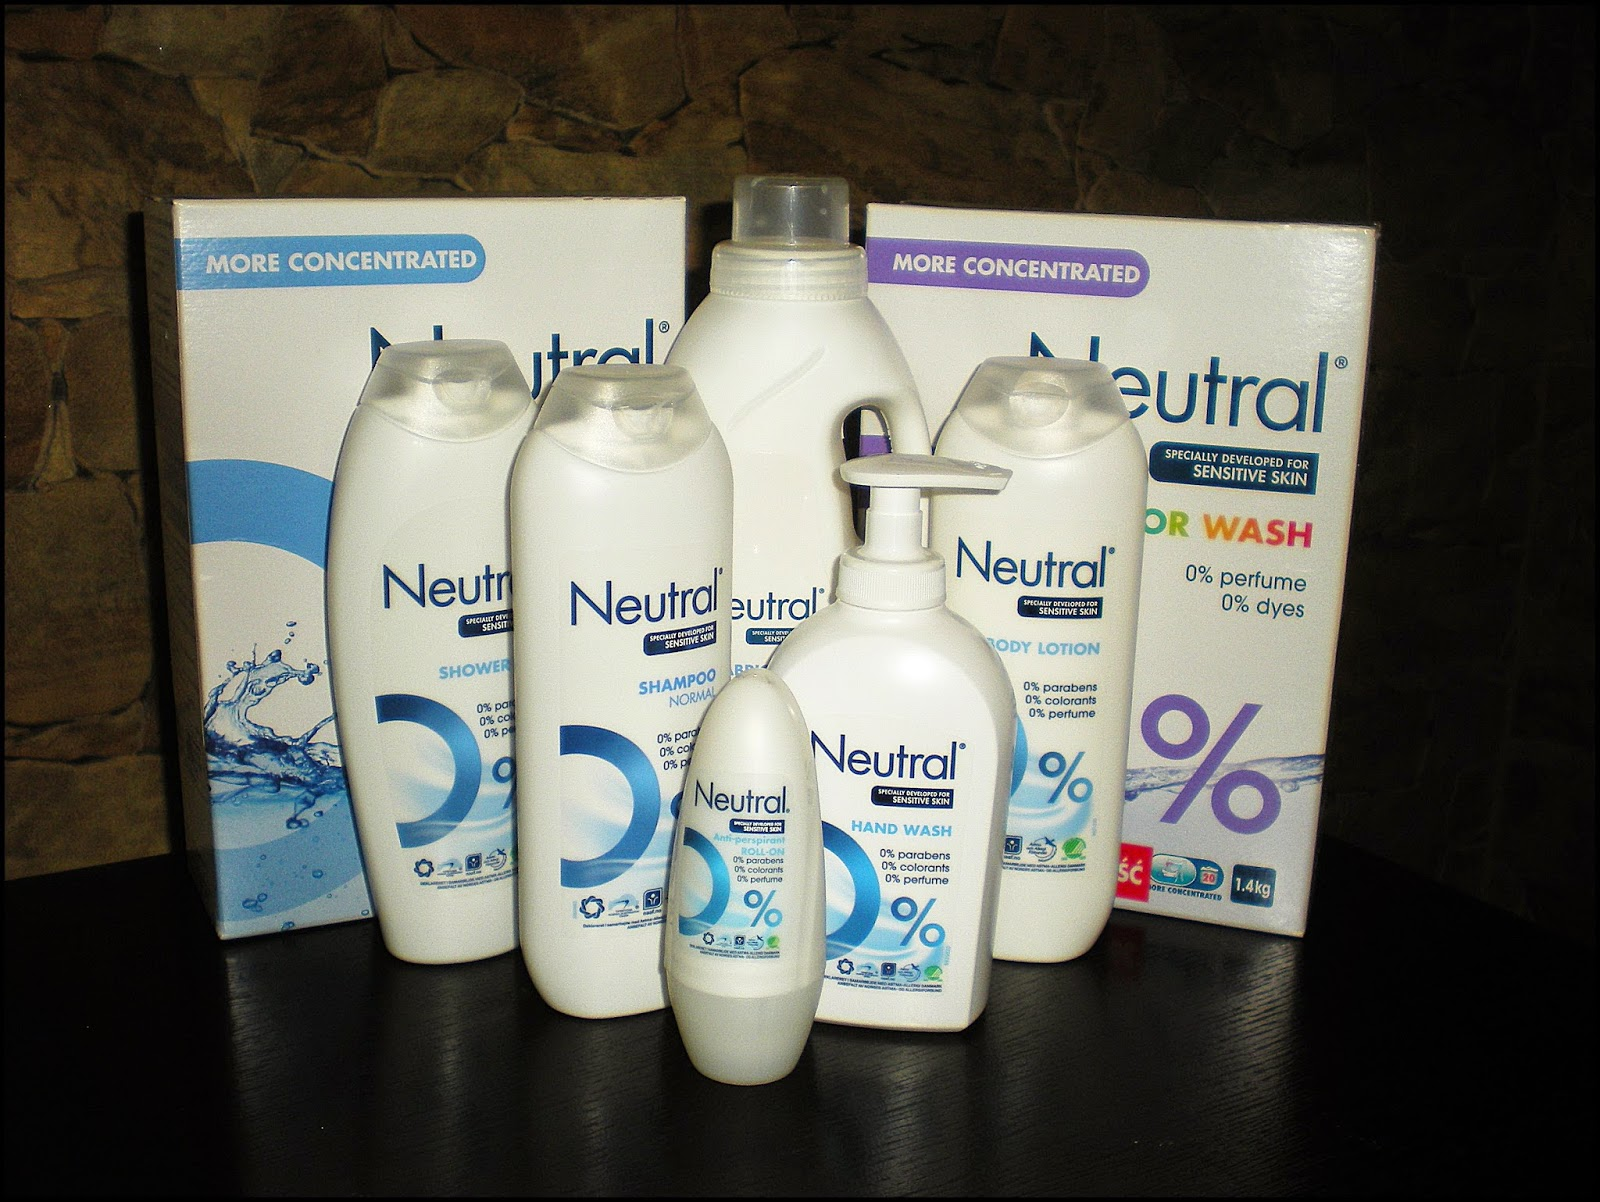 Testuję produkty Neutral z babyonline.pl